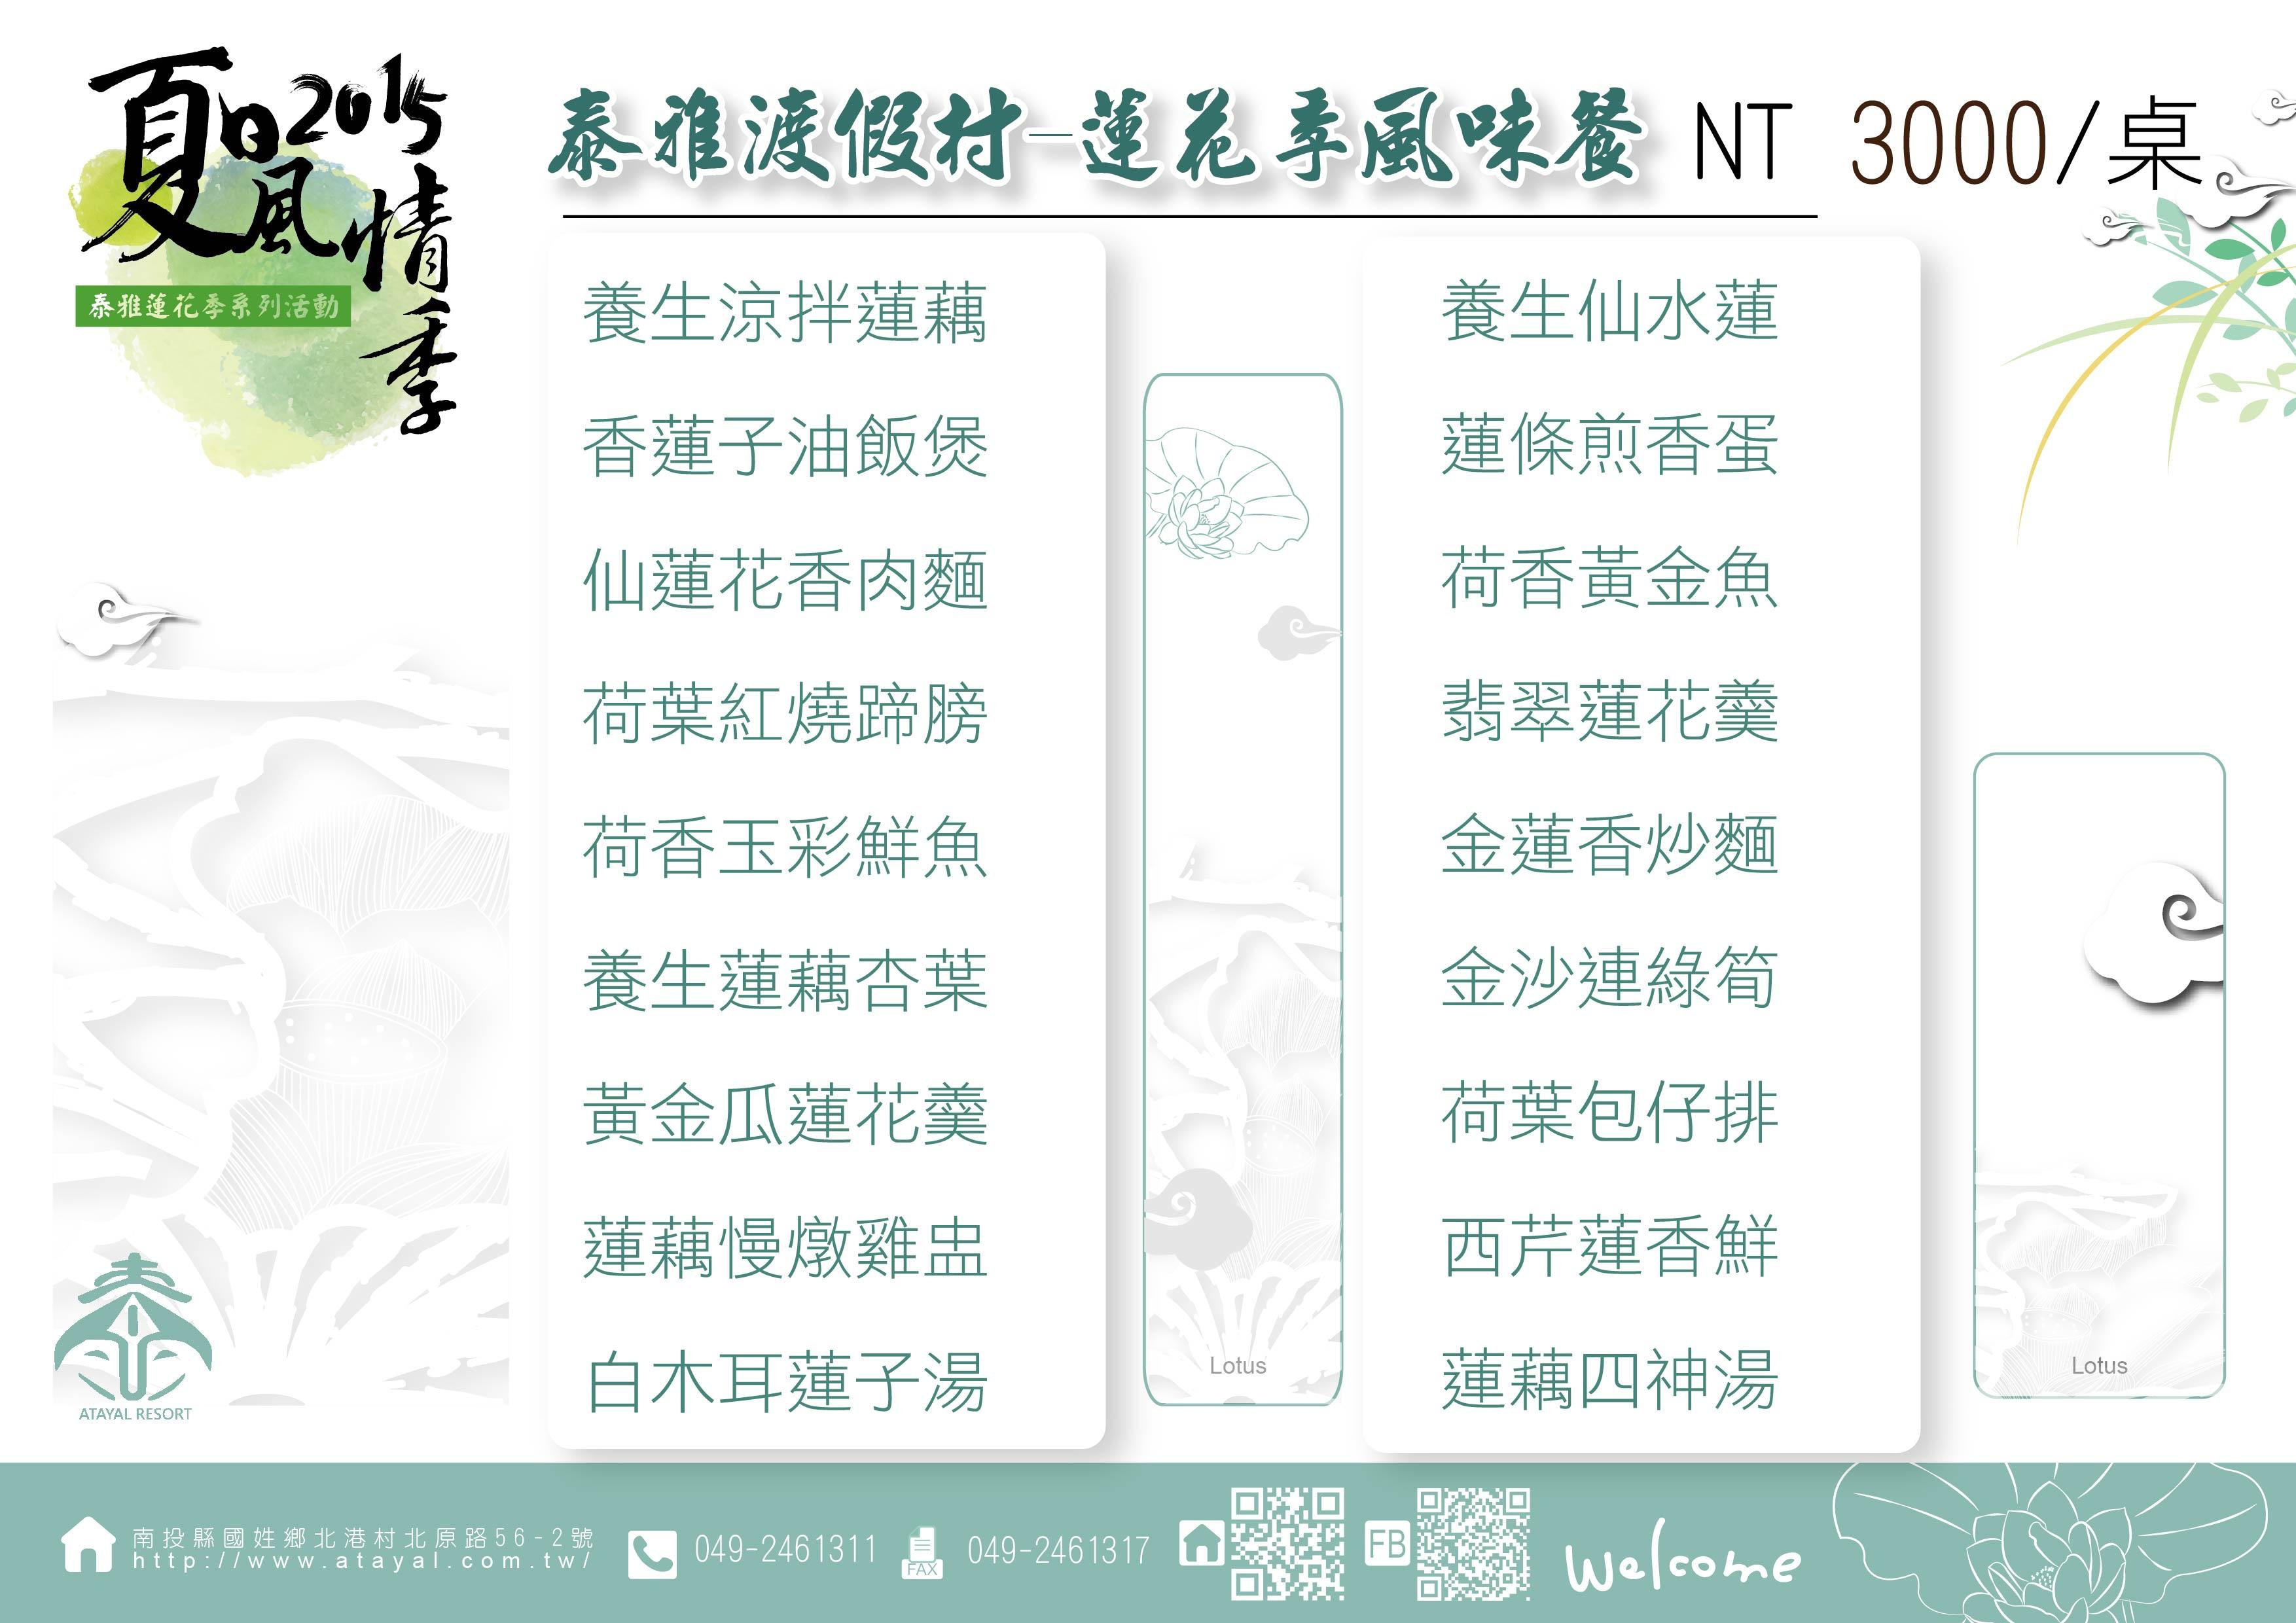 RGB2015-6-5泰雅蓮花季  蓮花餐 菜單 原檔-01-01.jpg